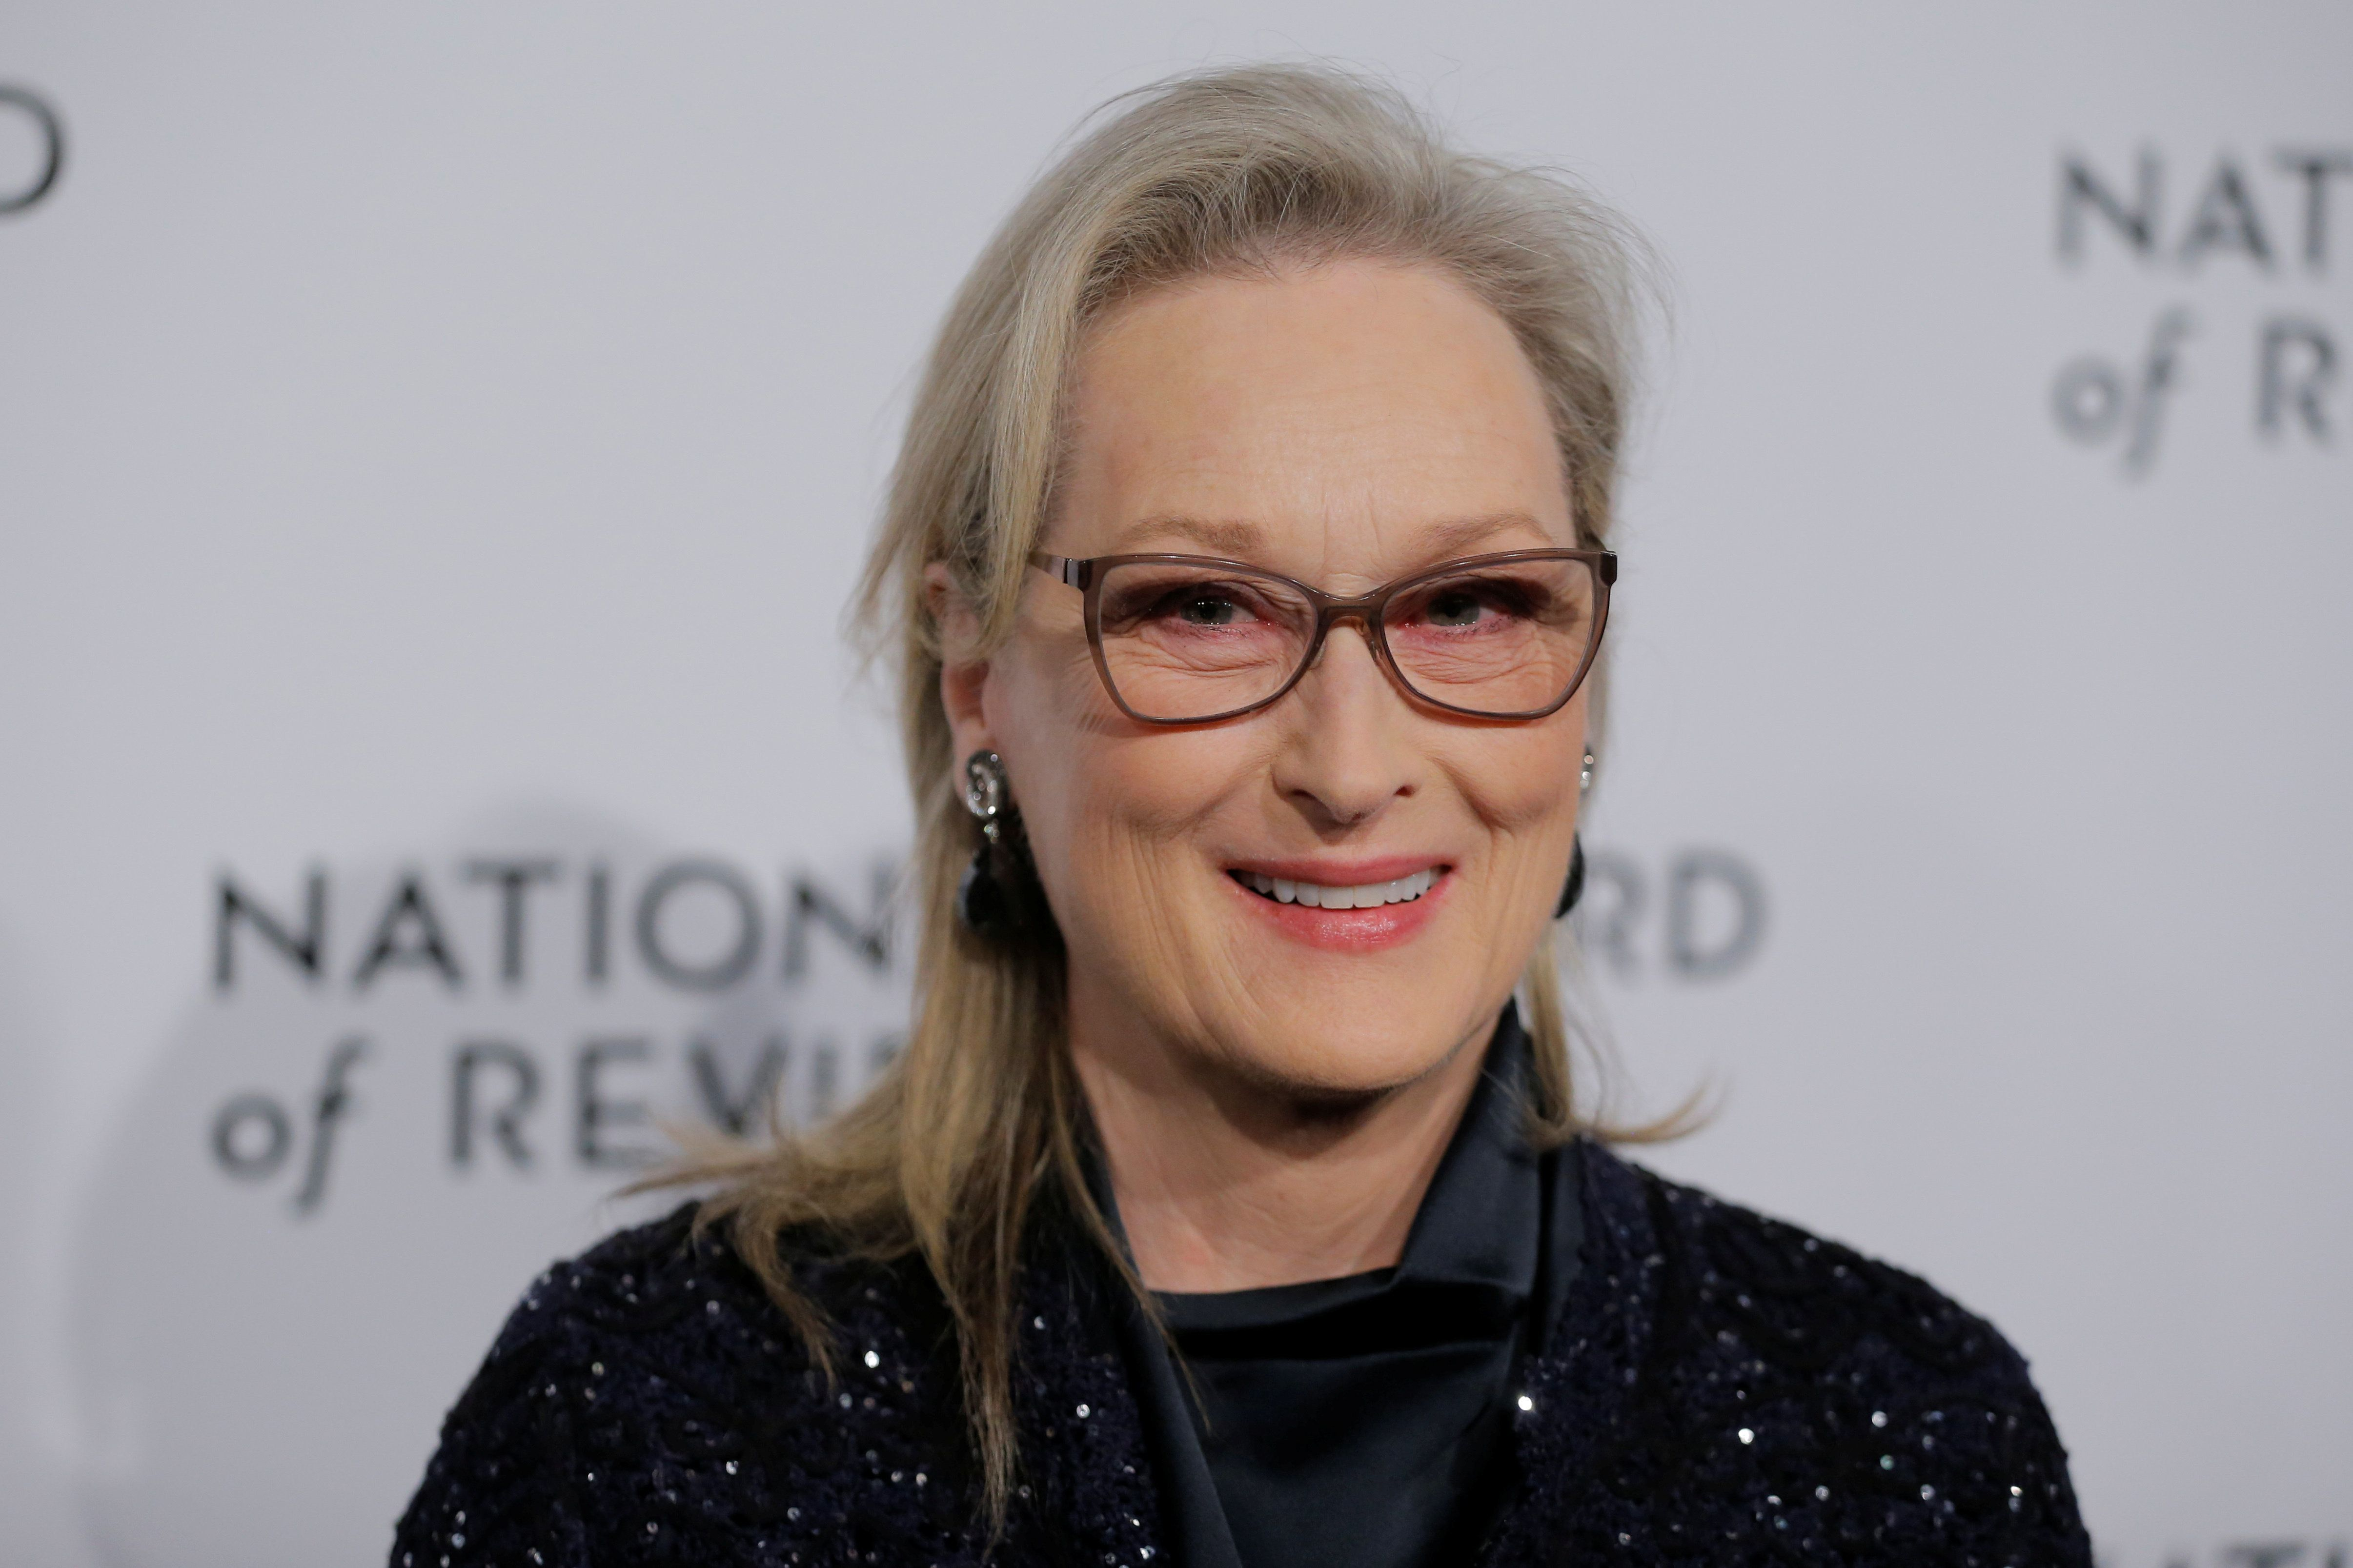 'Big Little Lies': Meryl Streep Joins Season 2 Cast Of HBO Series